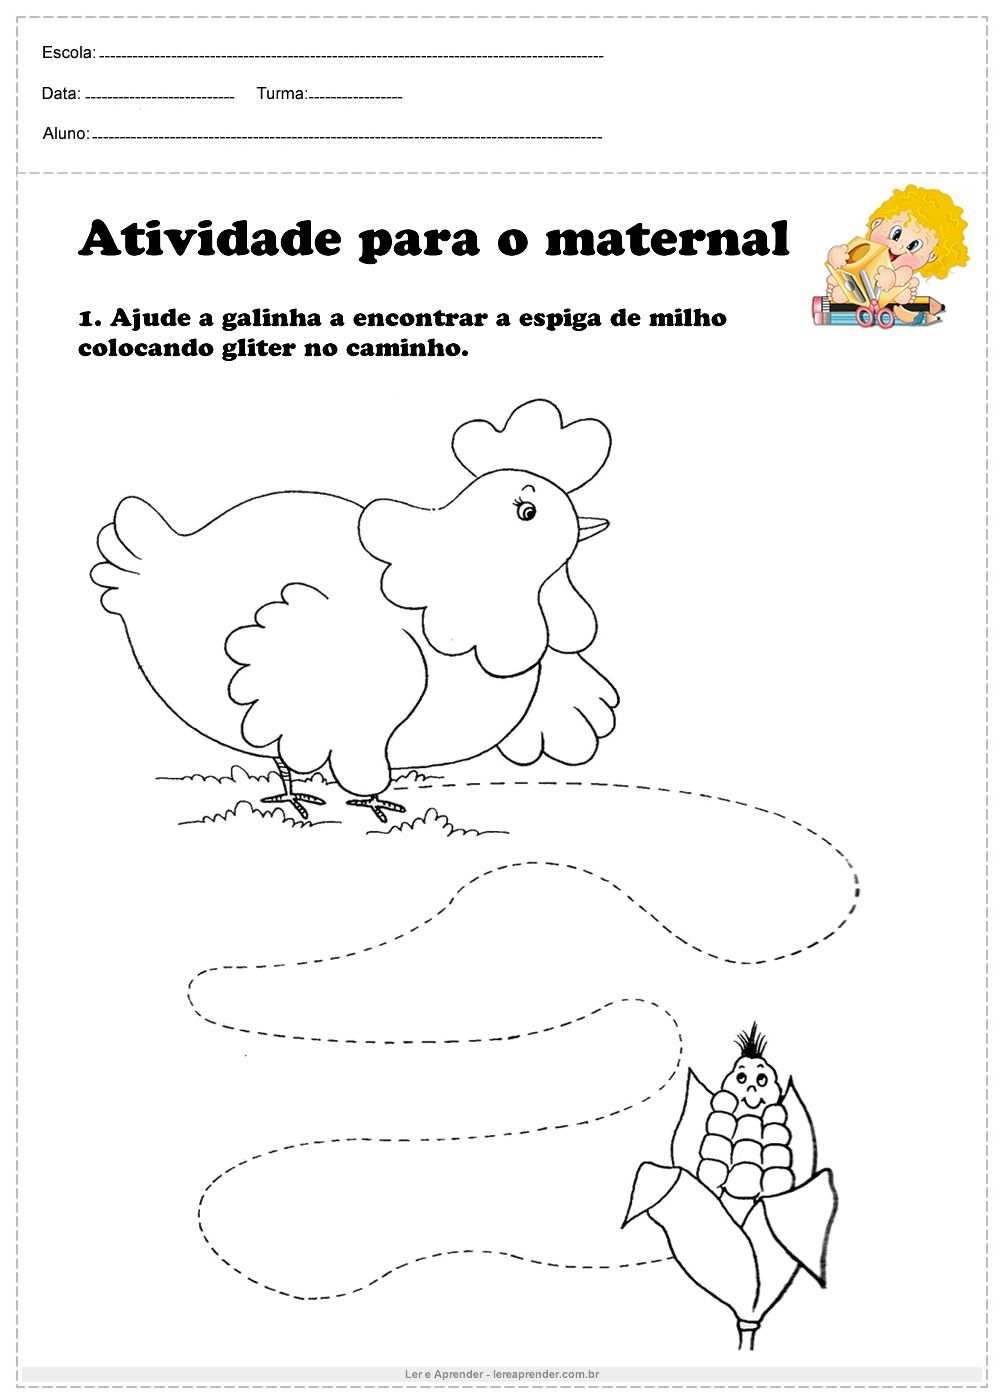 Atividade Para O Maternal Ajude A Galinha Atividades Para